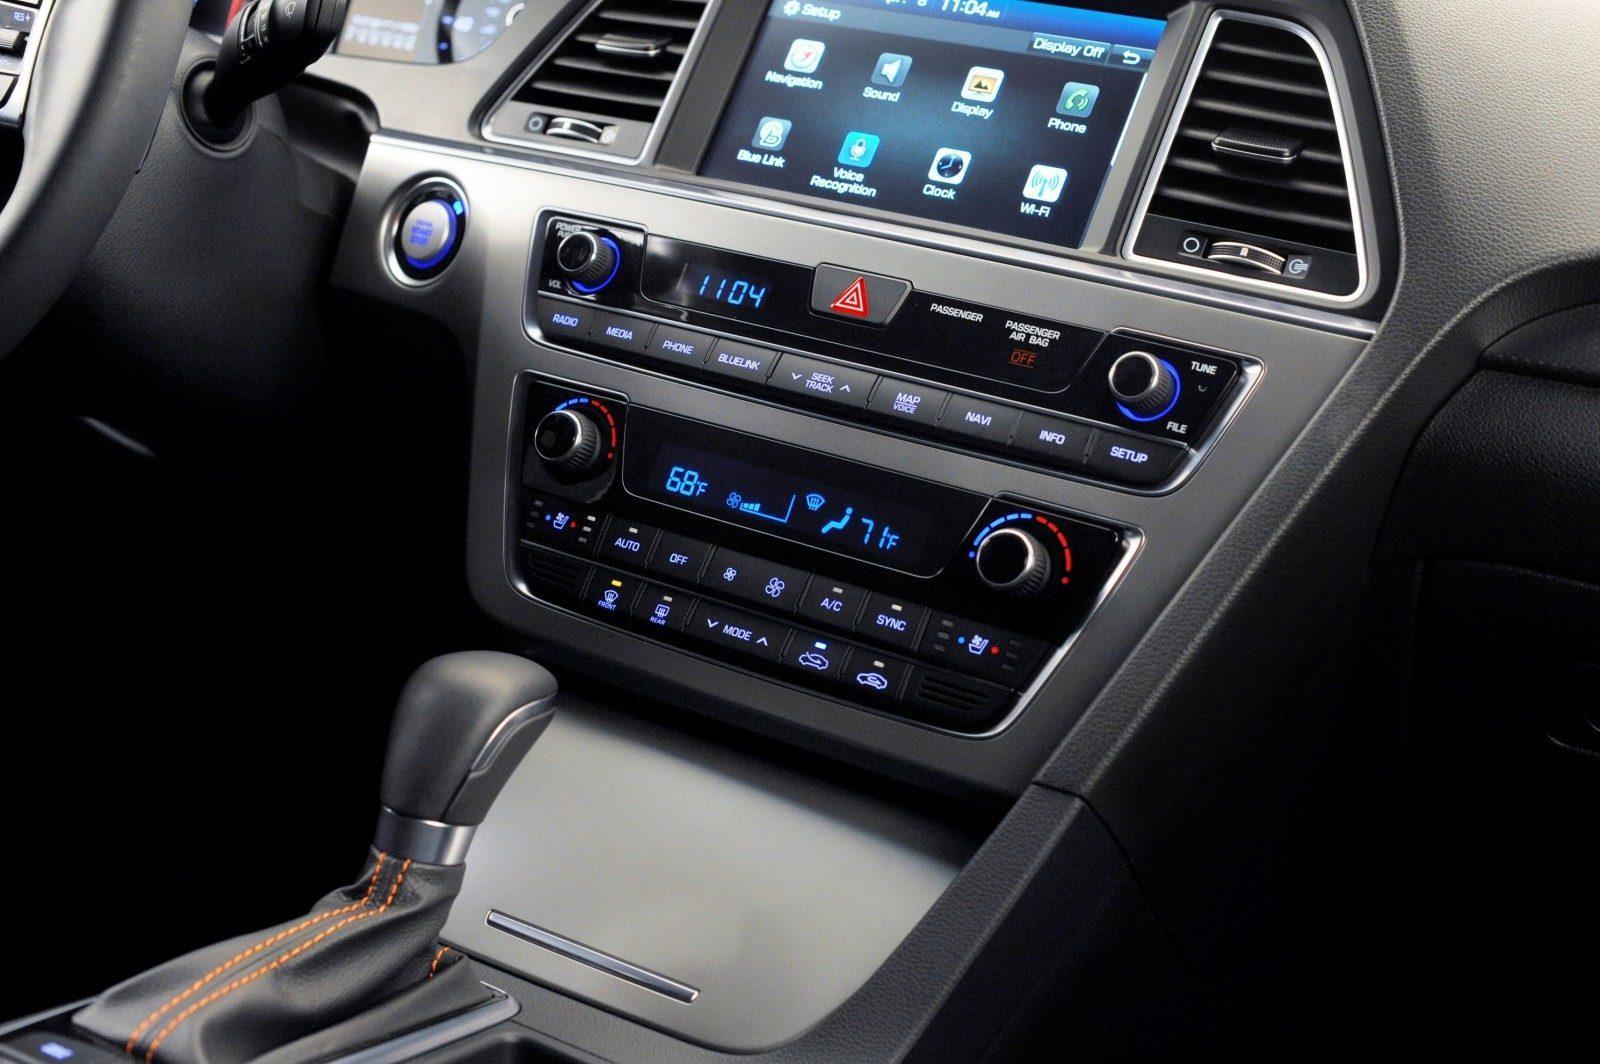 Road Test Review - 2015 Hyundai Sonata - INTERIOR Focus